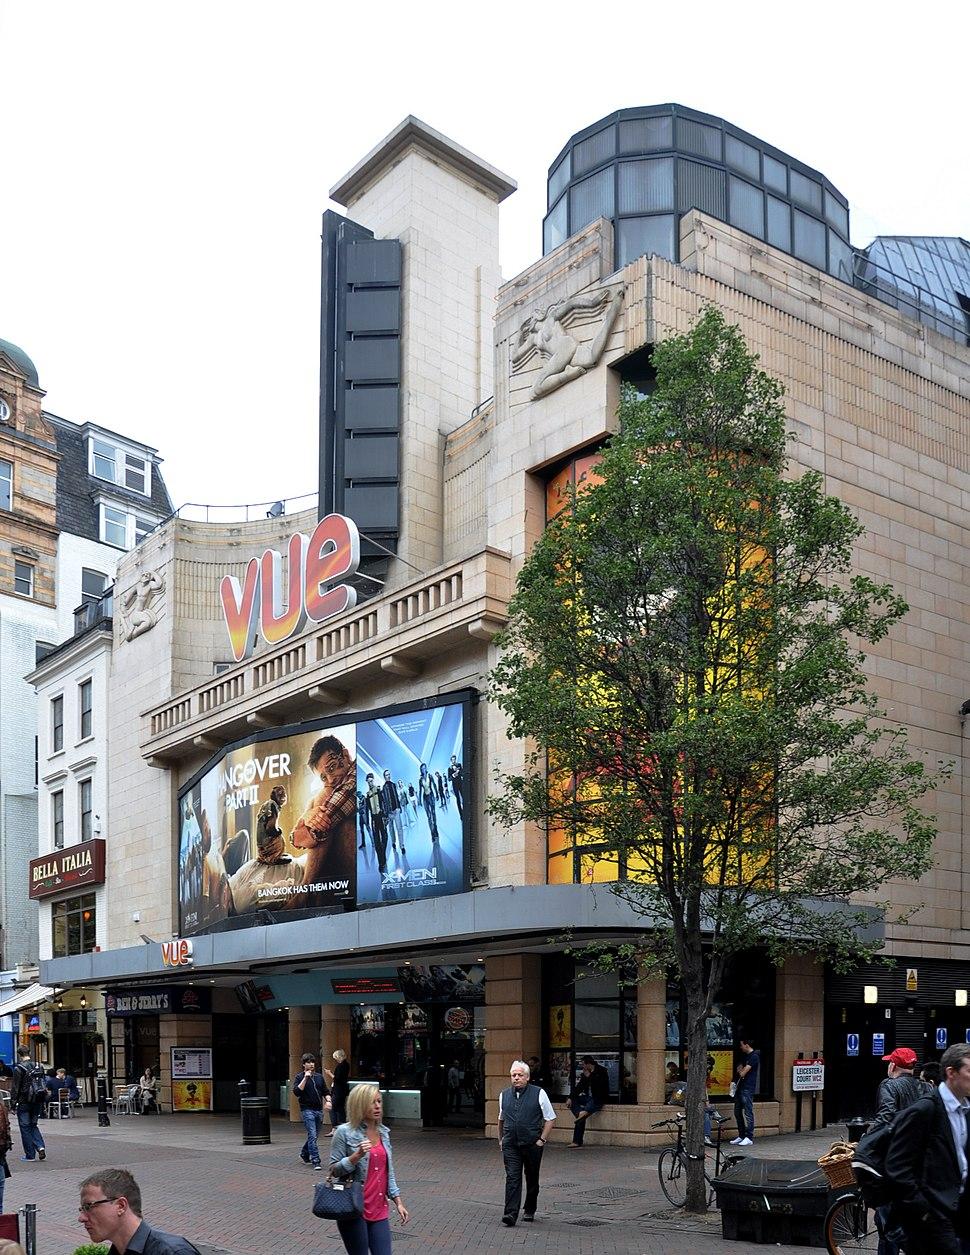 Vue cinema London 2011 2